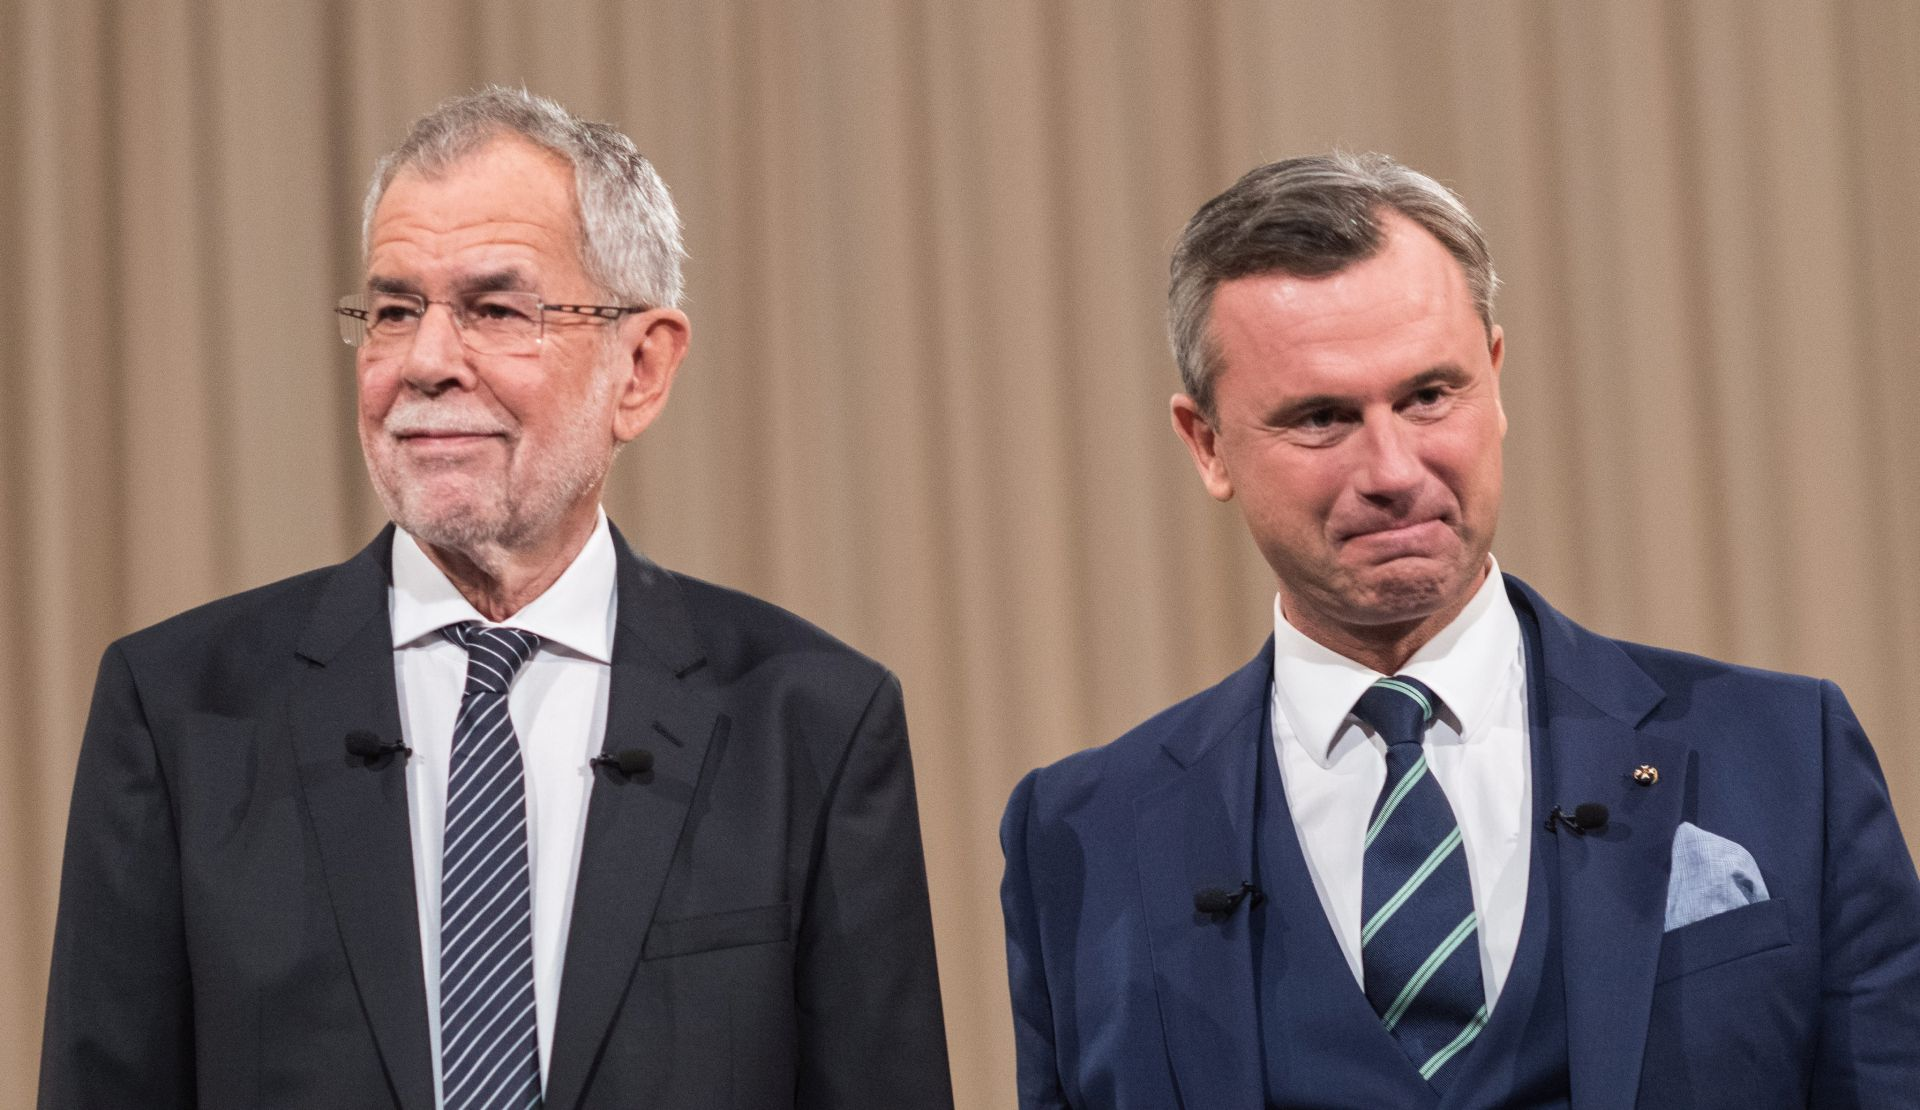 Nakon Brexita i Trumpa je li red na Austriji?